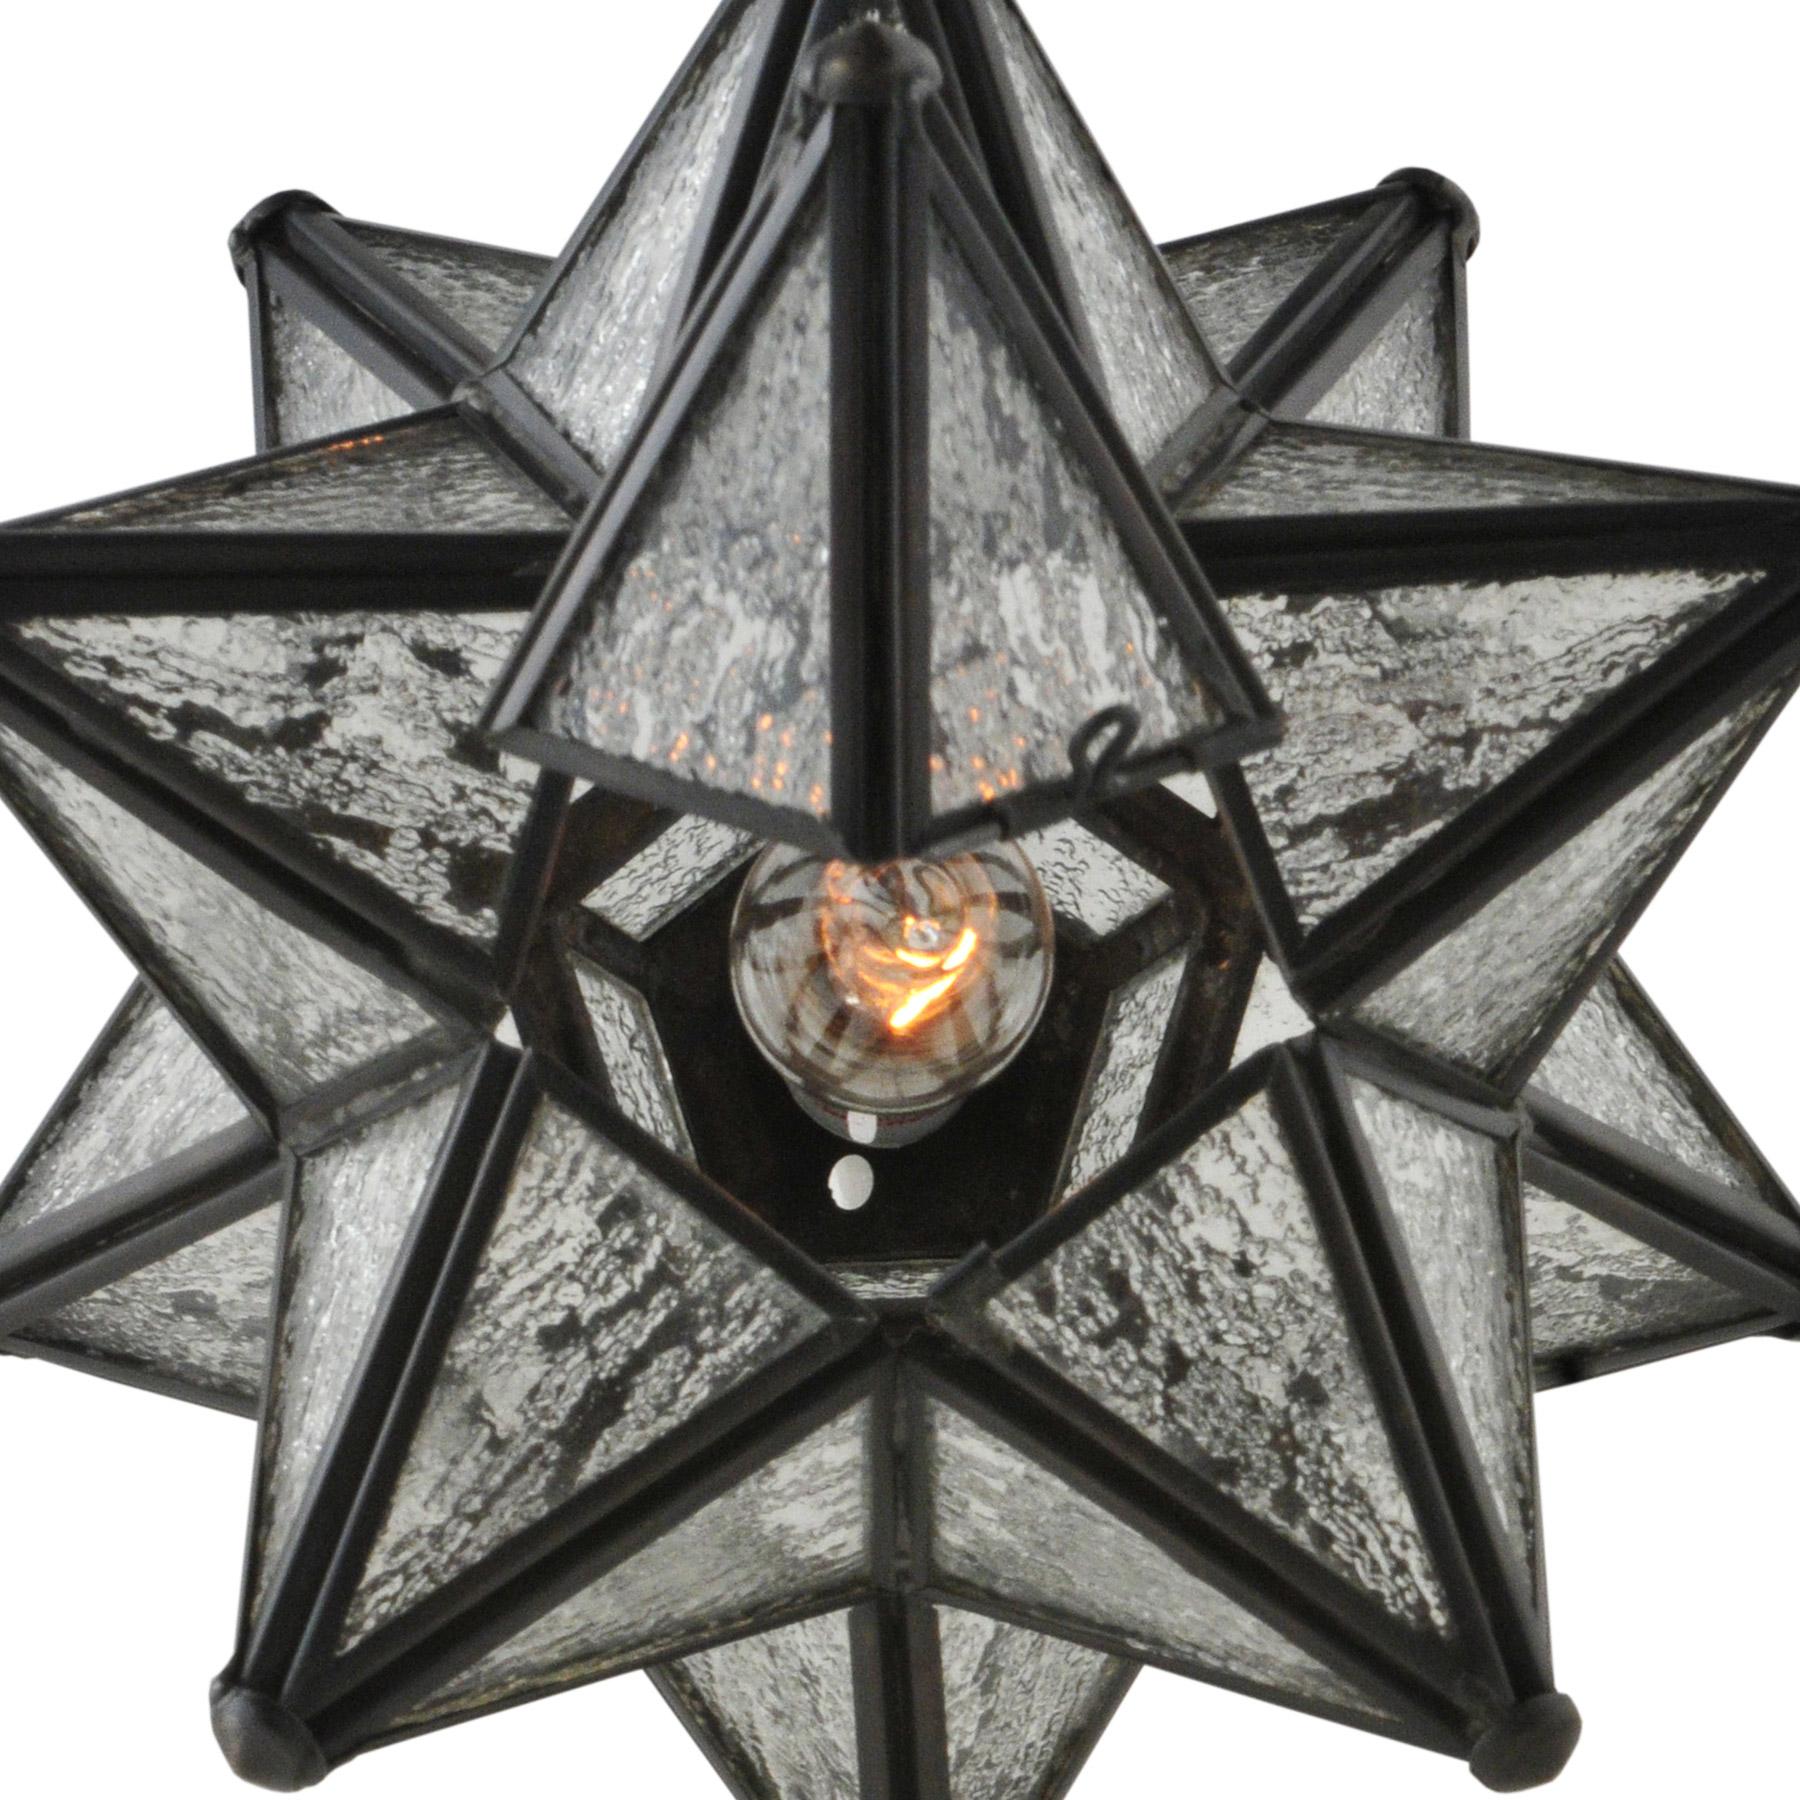 Meyda 119794 Moravian Star Wall Sconce